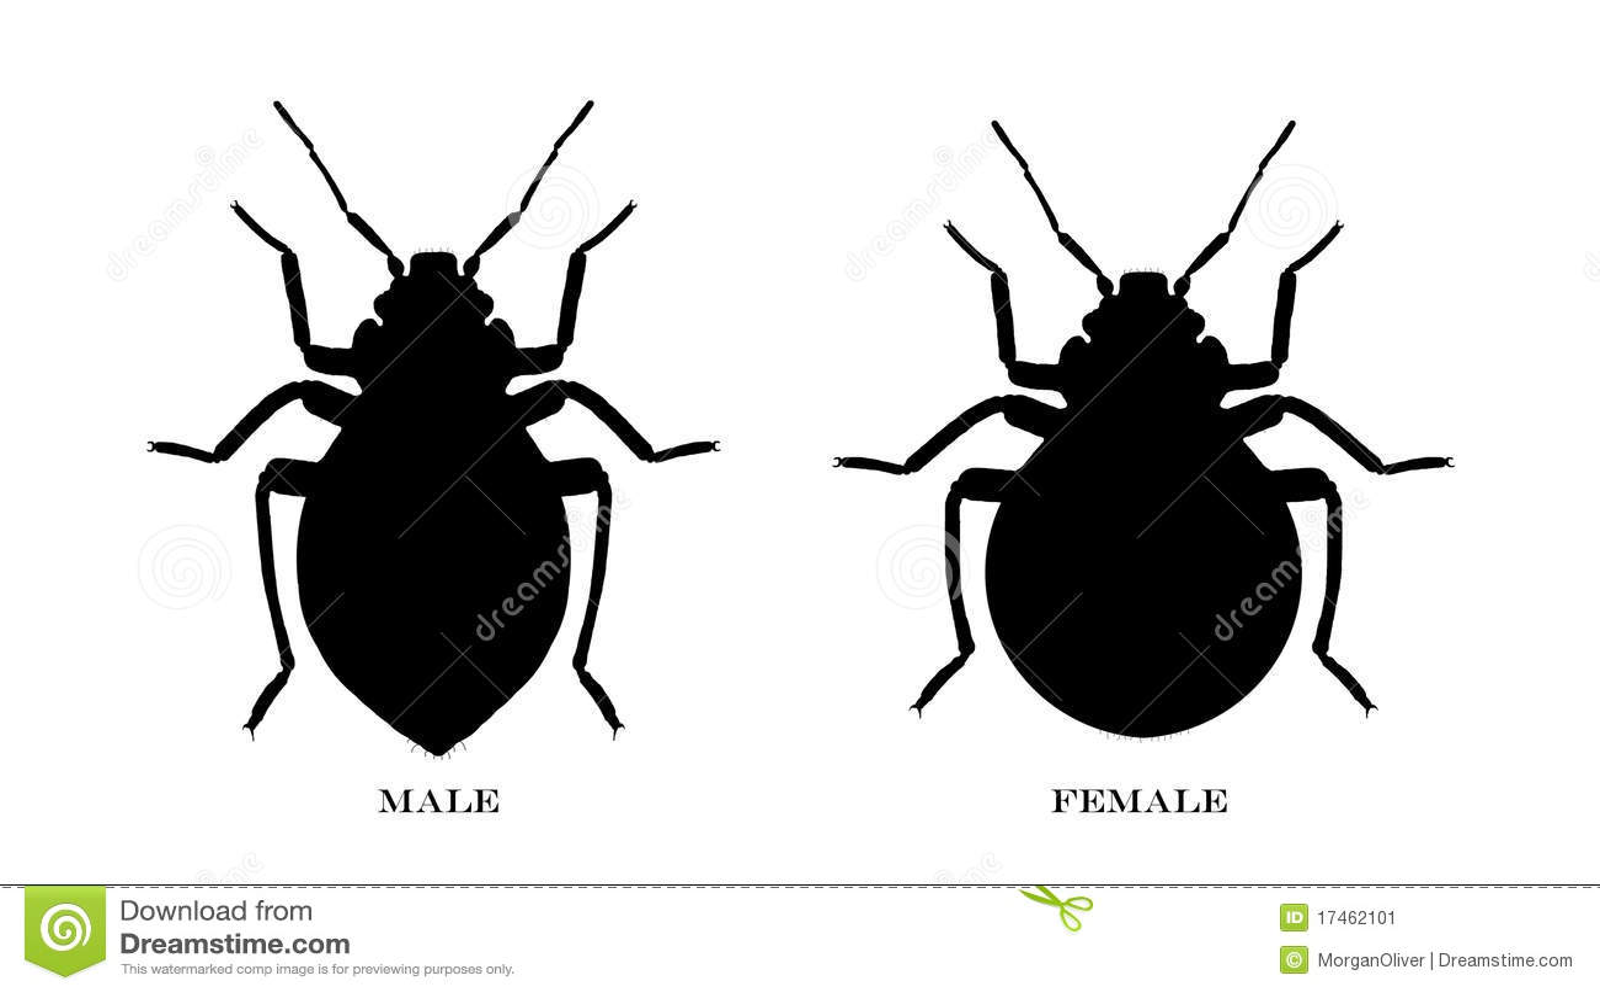 Male And Female Black Illustrated Bedbugs Stock Illustration